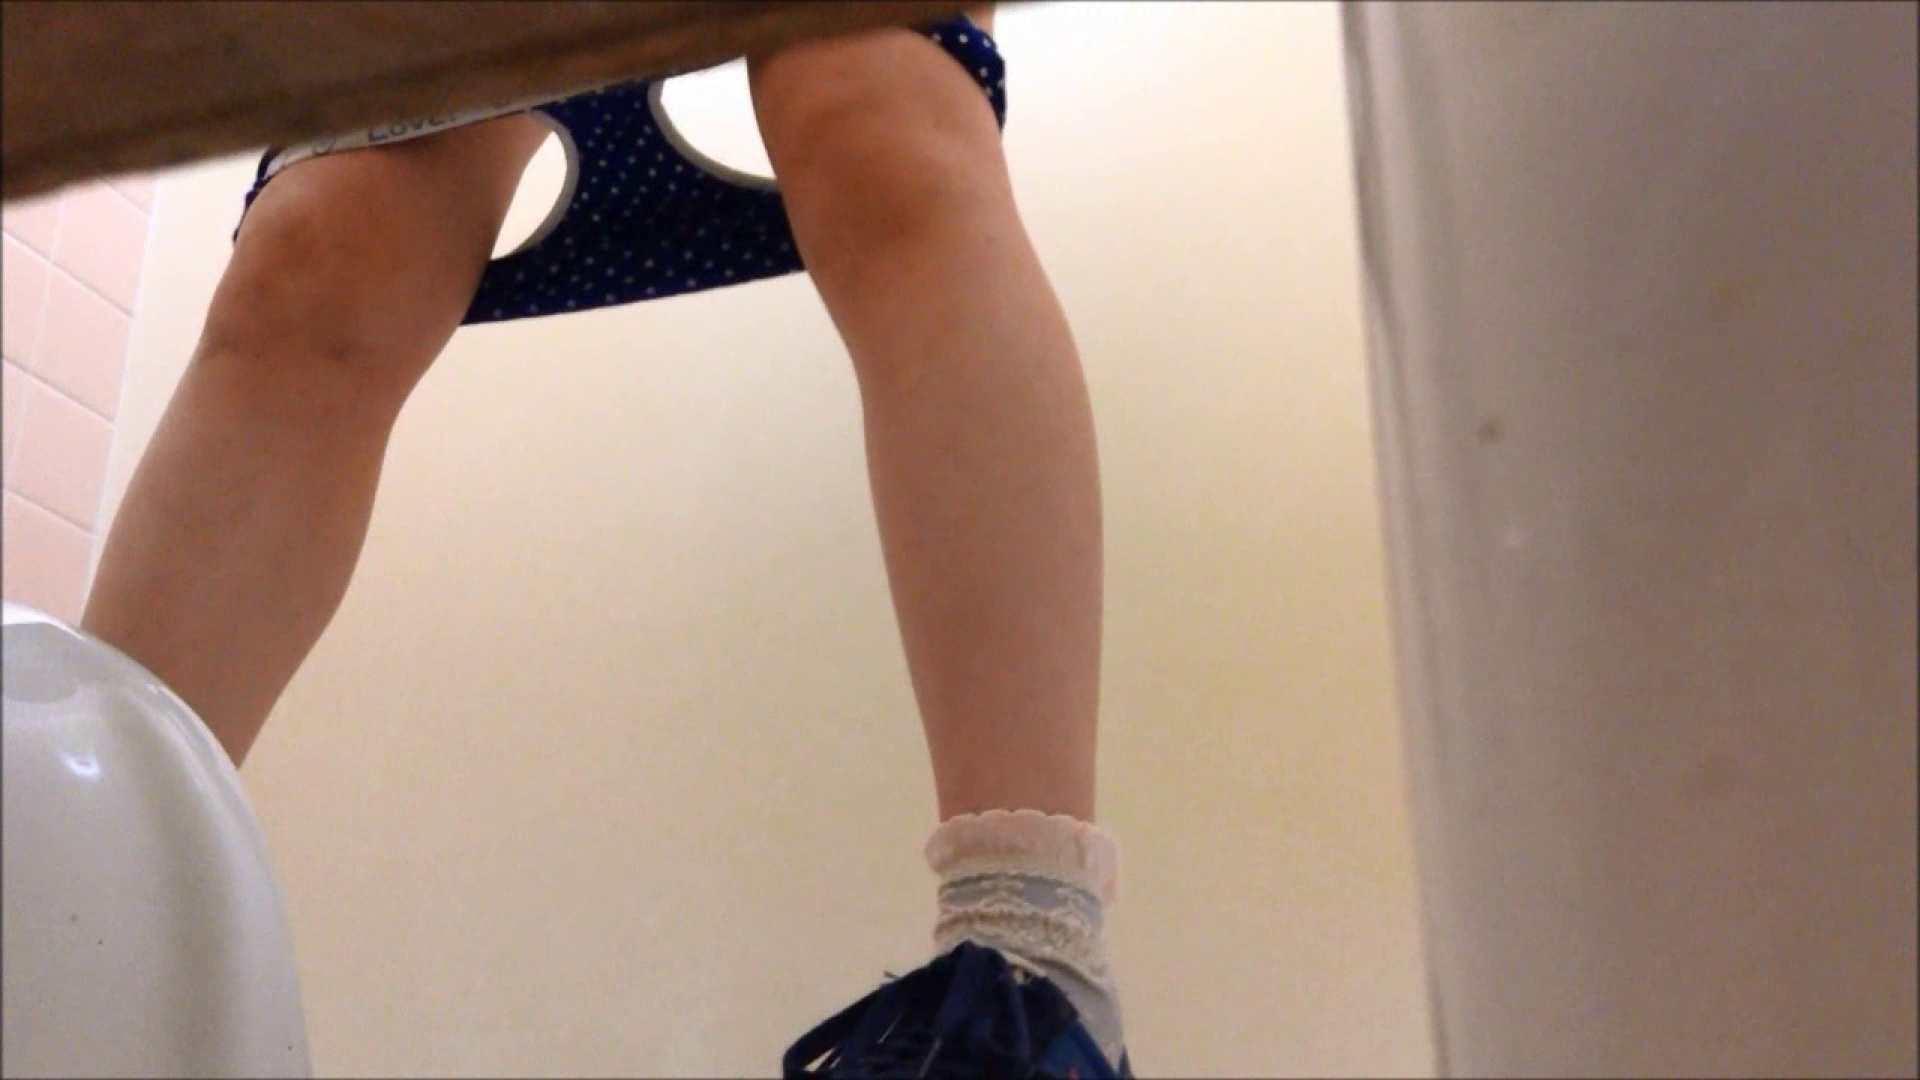 某有名大学女性洗面所 vol.16 OLのエロ生活 オマンコ無修正動画無料 45連発 26